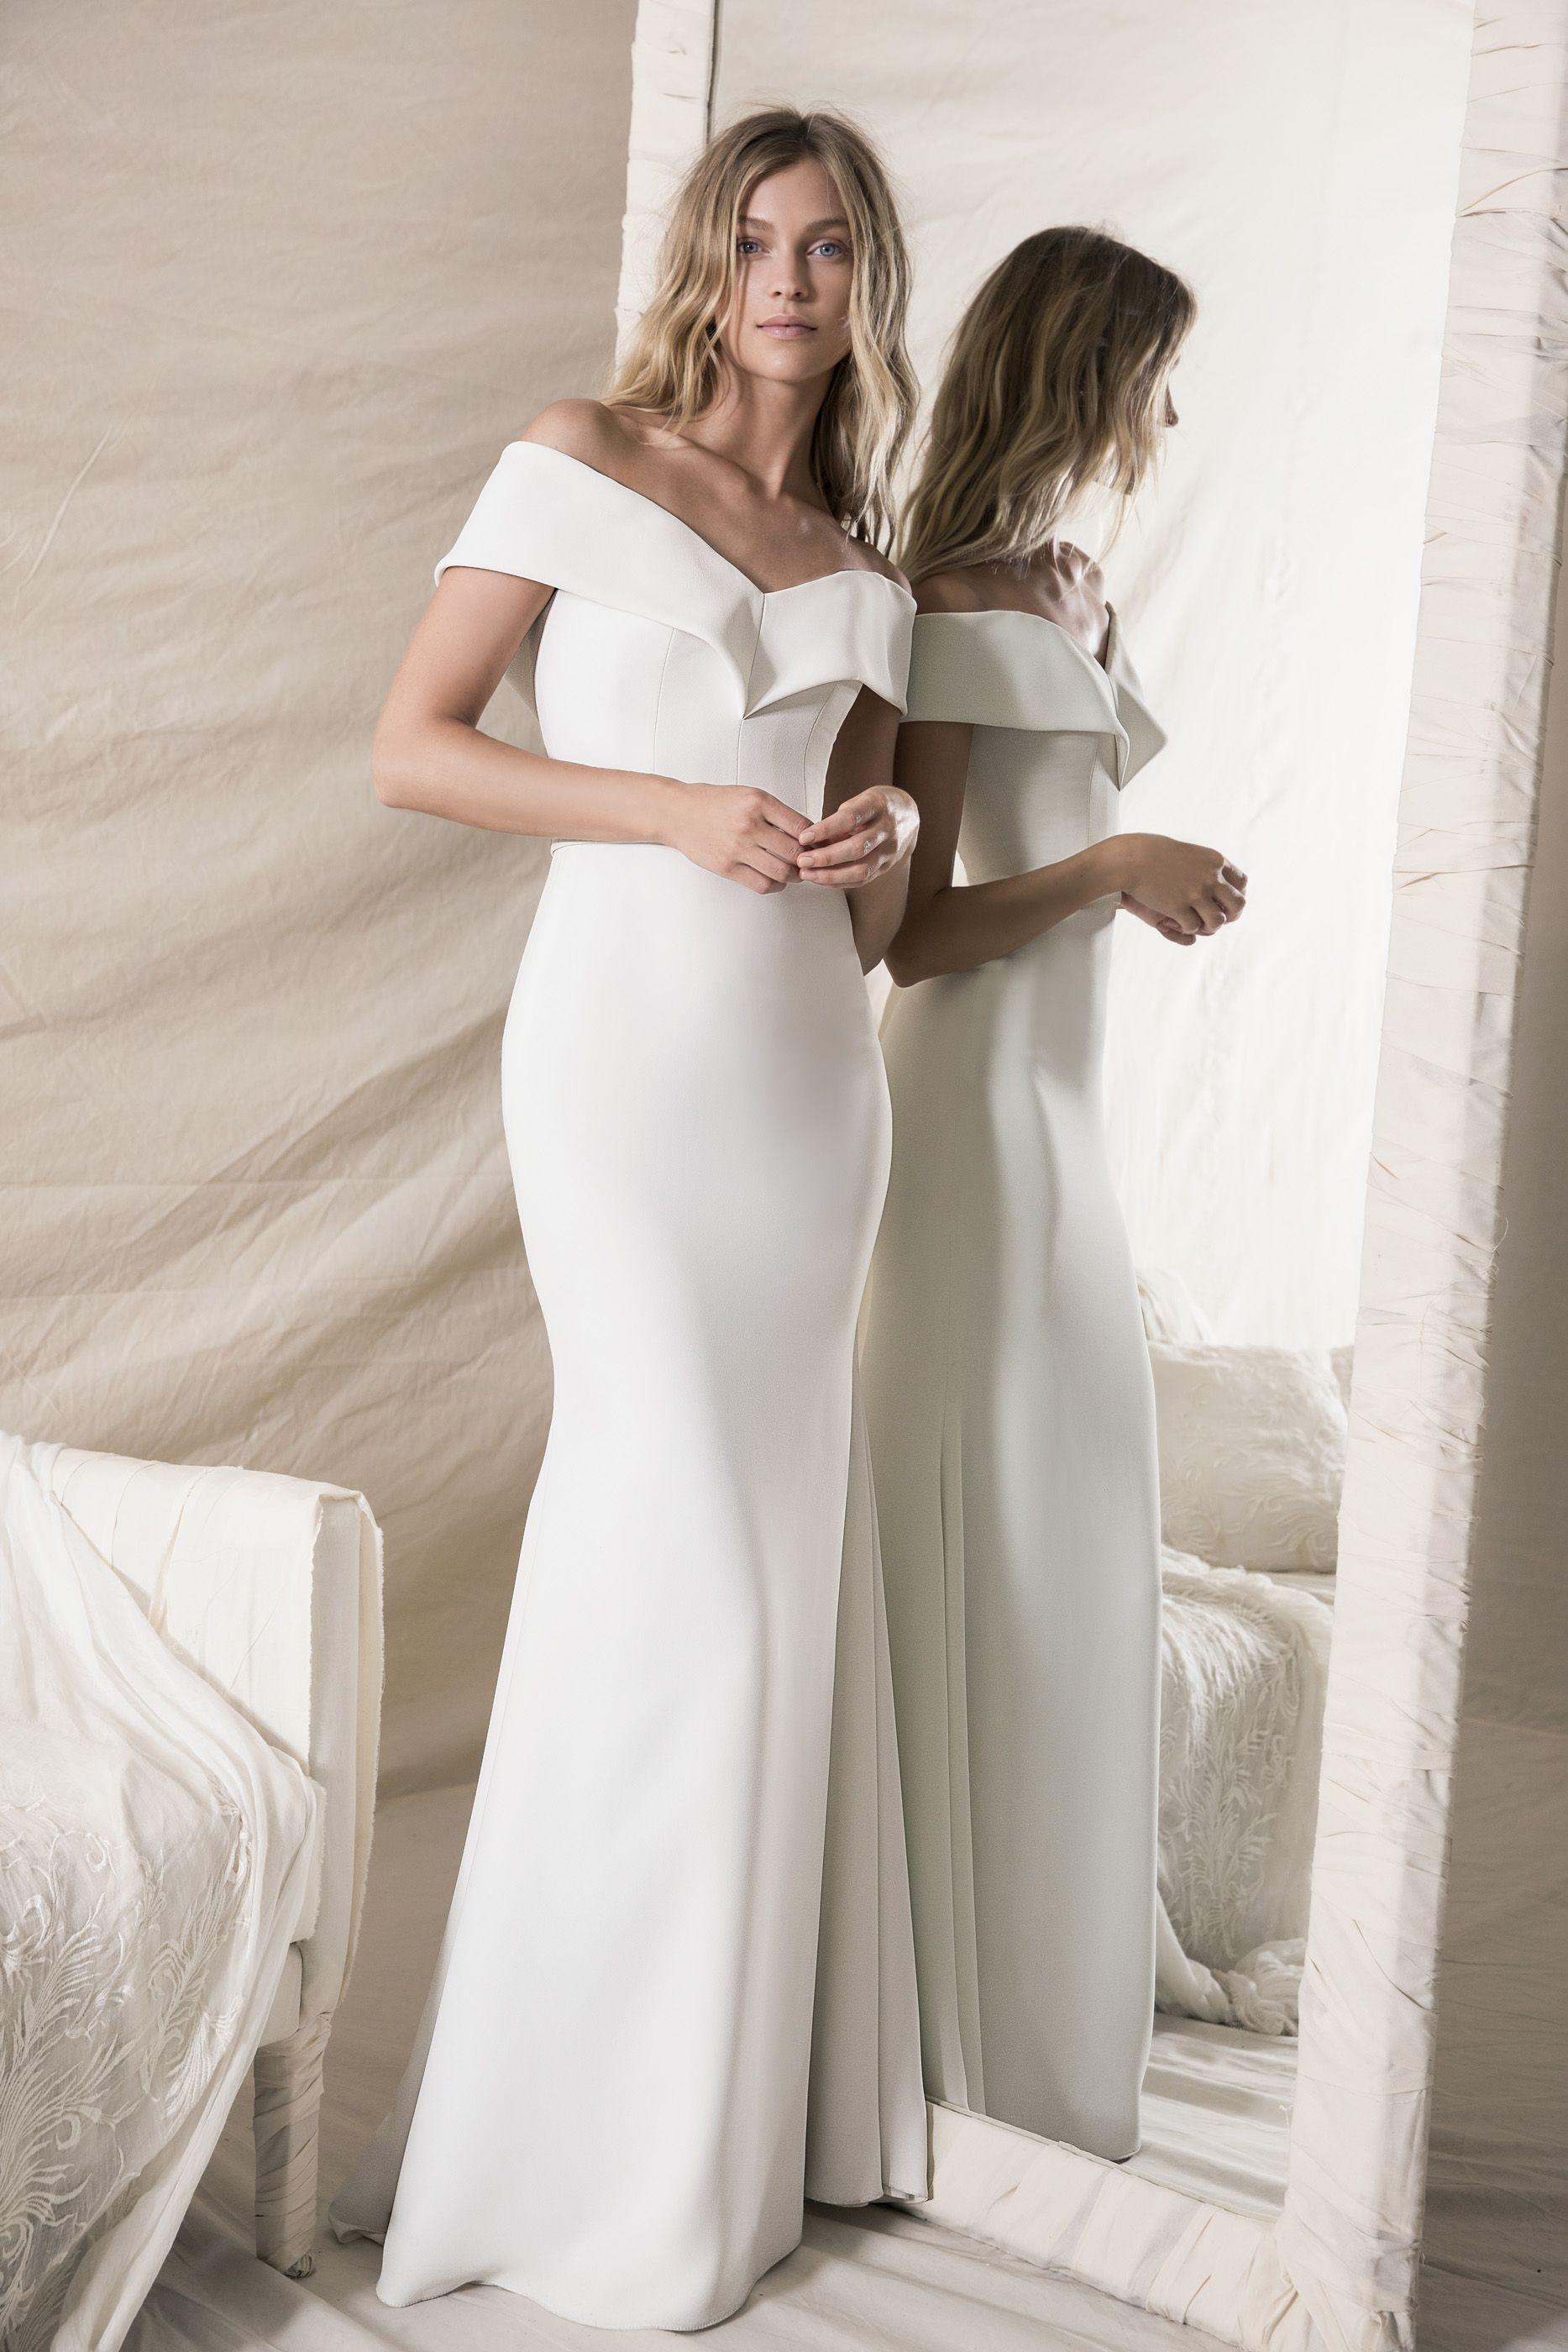 Wedding Dresses For Registry Office Wedding Uk | Midway Media